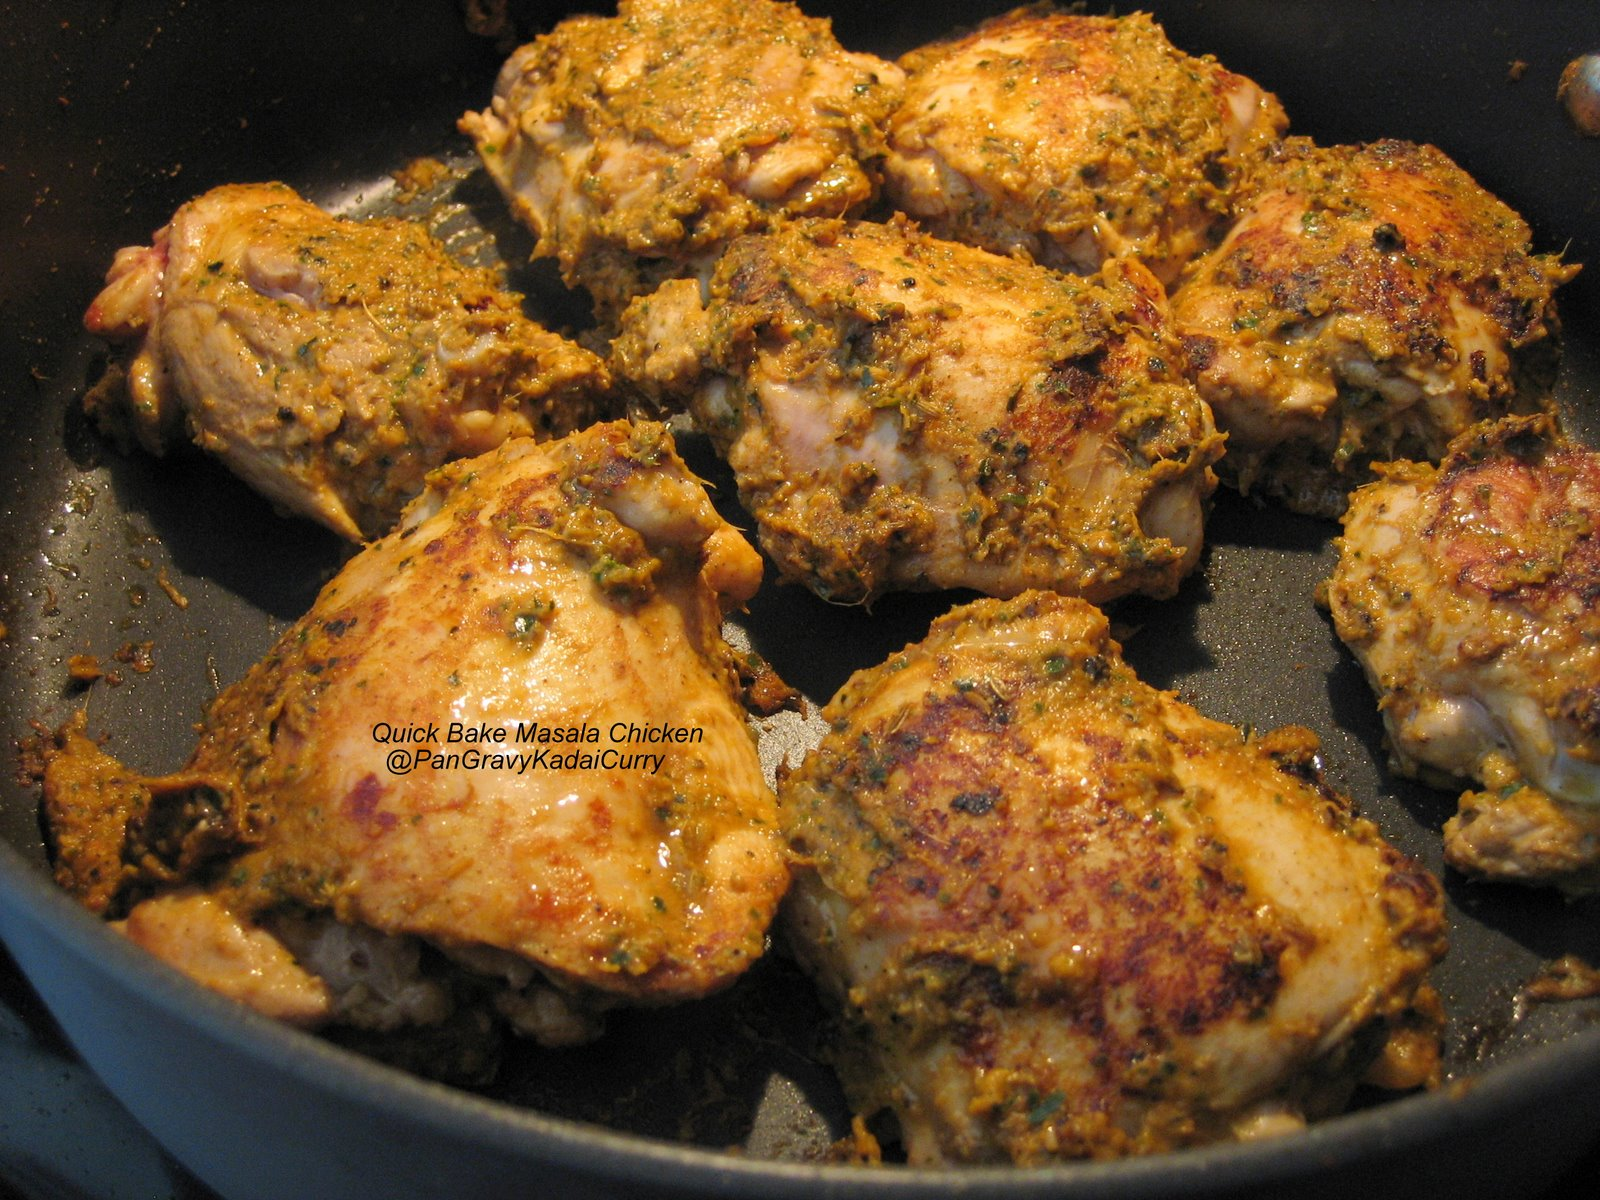 Pan Gravy Kadai Curry Recipereplica Quick Bake Quot Masala